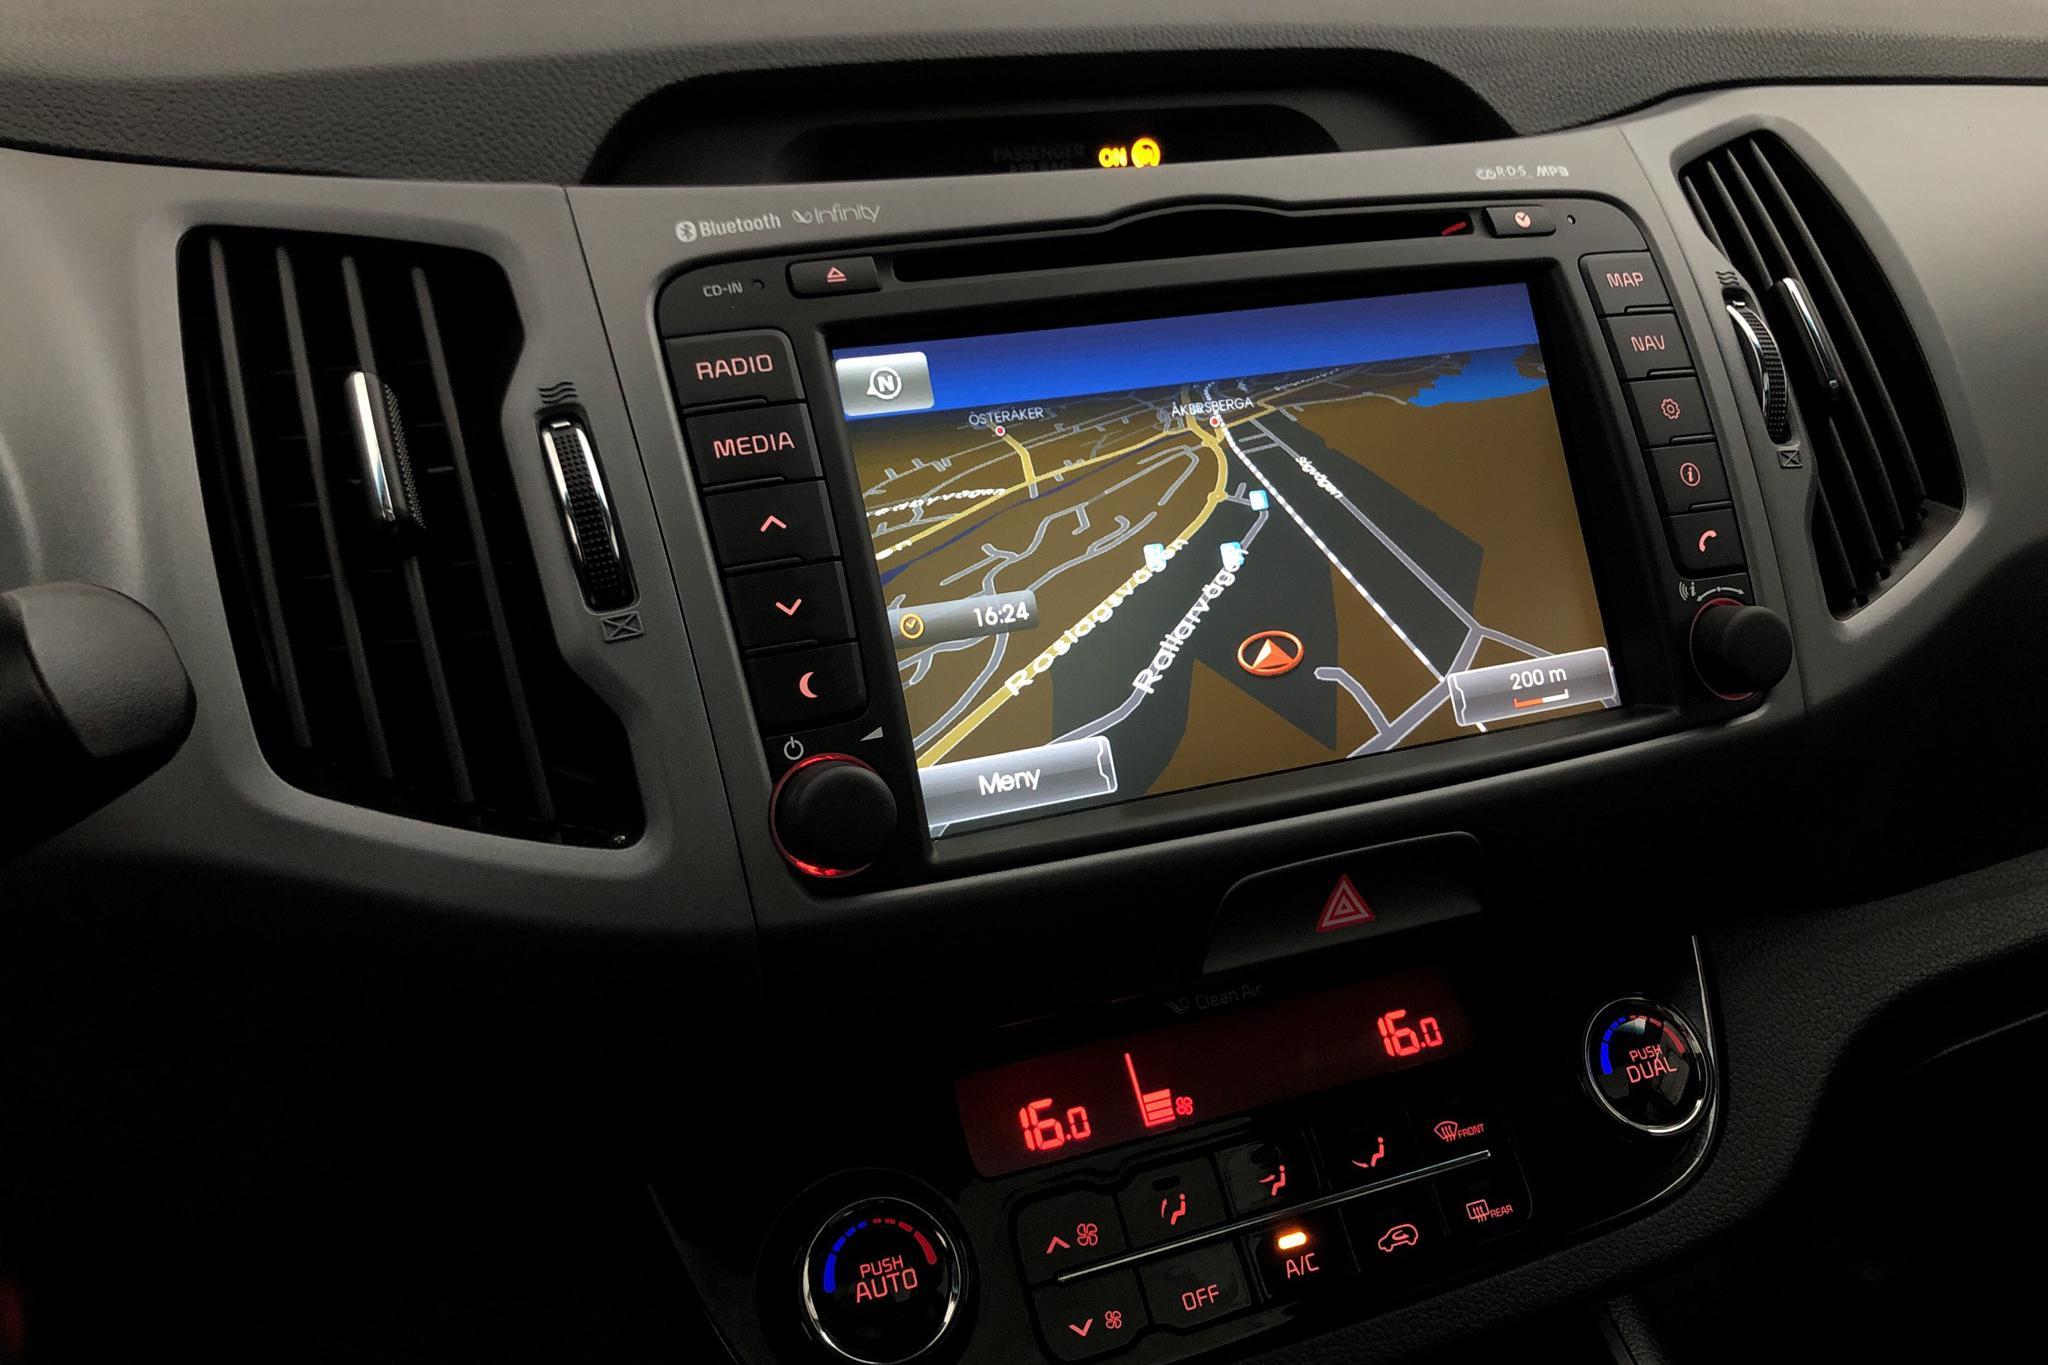 KIA Sportage 1.6 2WD (136hk) - 105 670 km - Manual - black - 2015